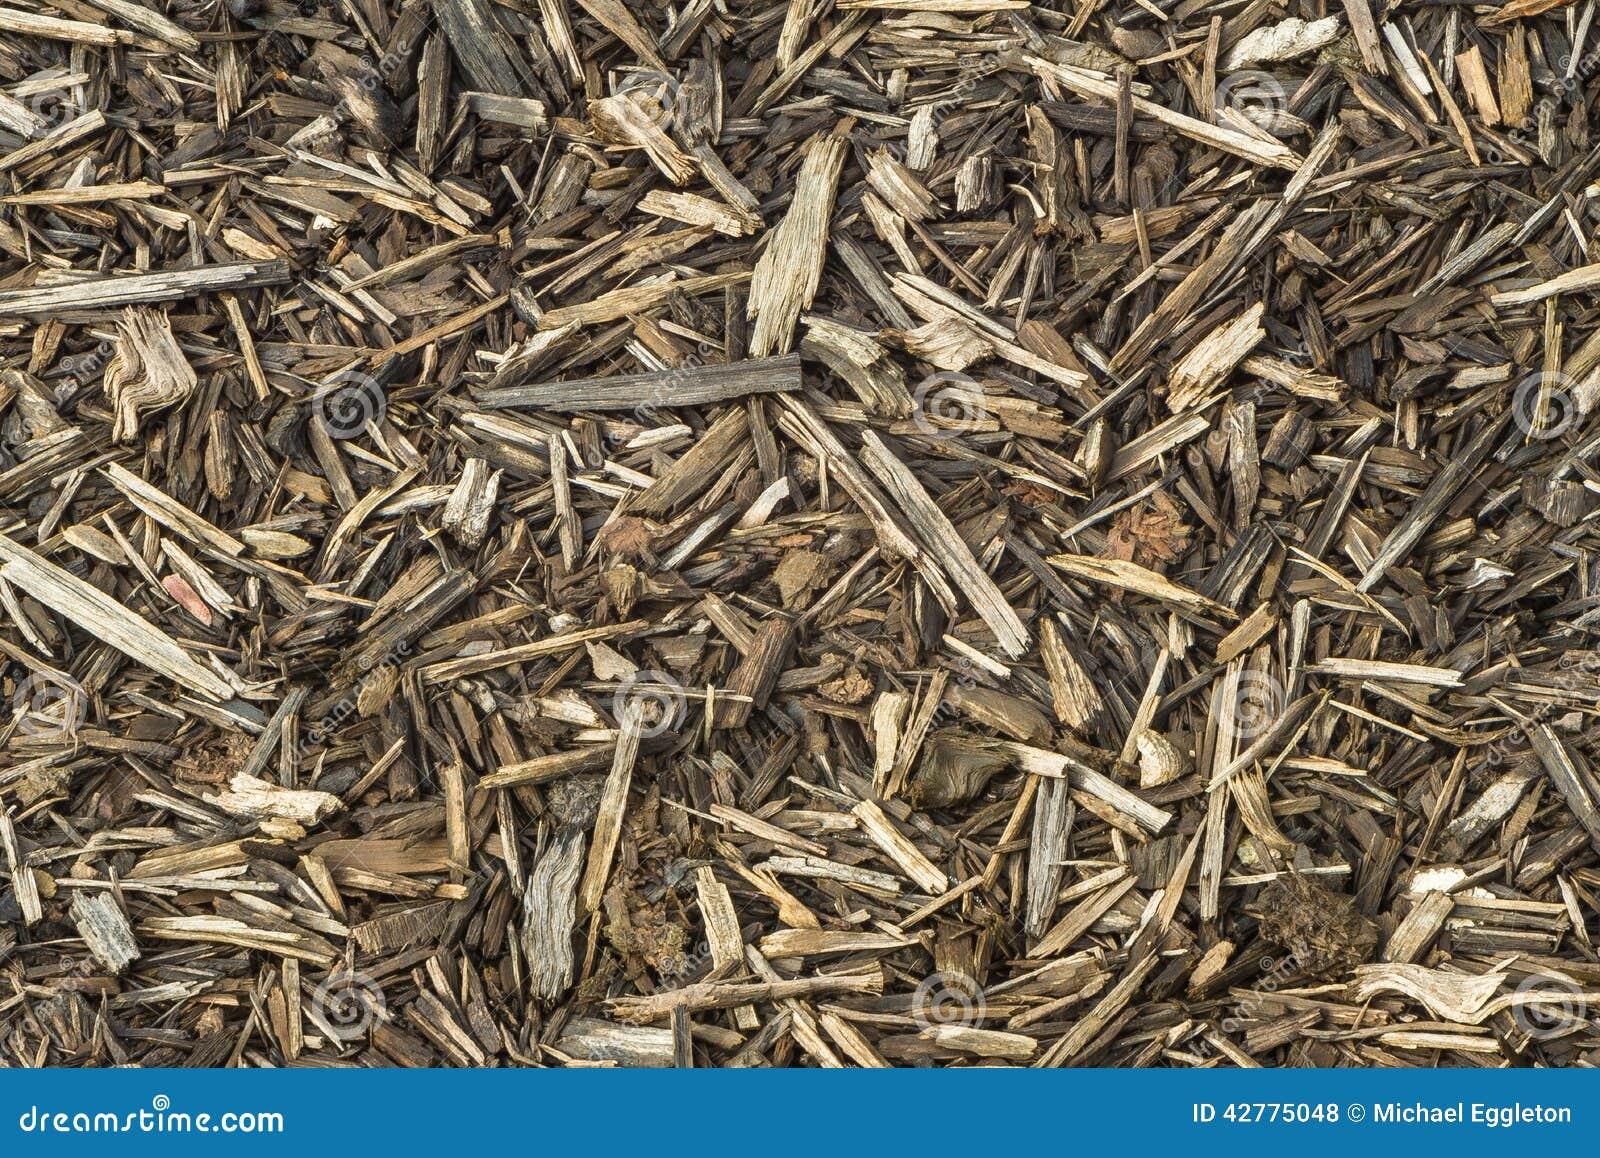 Holzspäne Stockfoto Bild Von Holz Garten Chip Bauholz 42775048